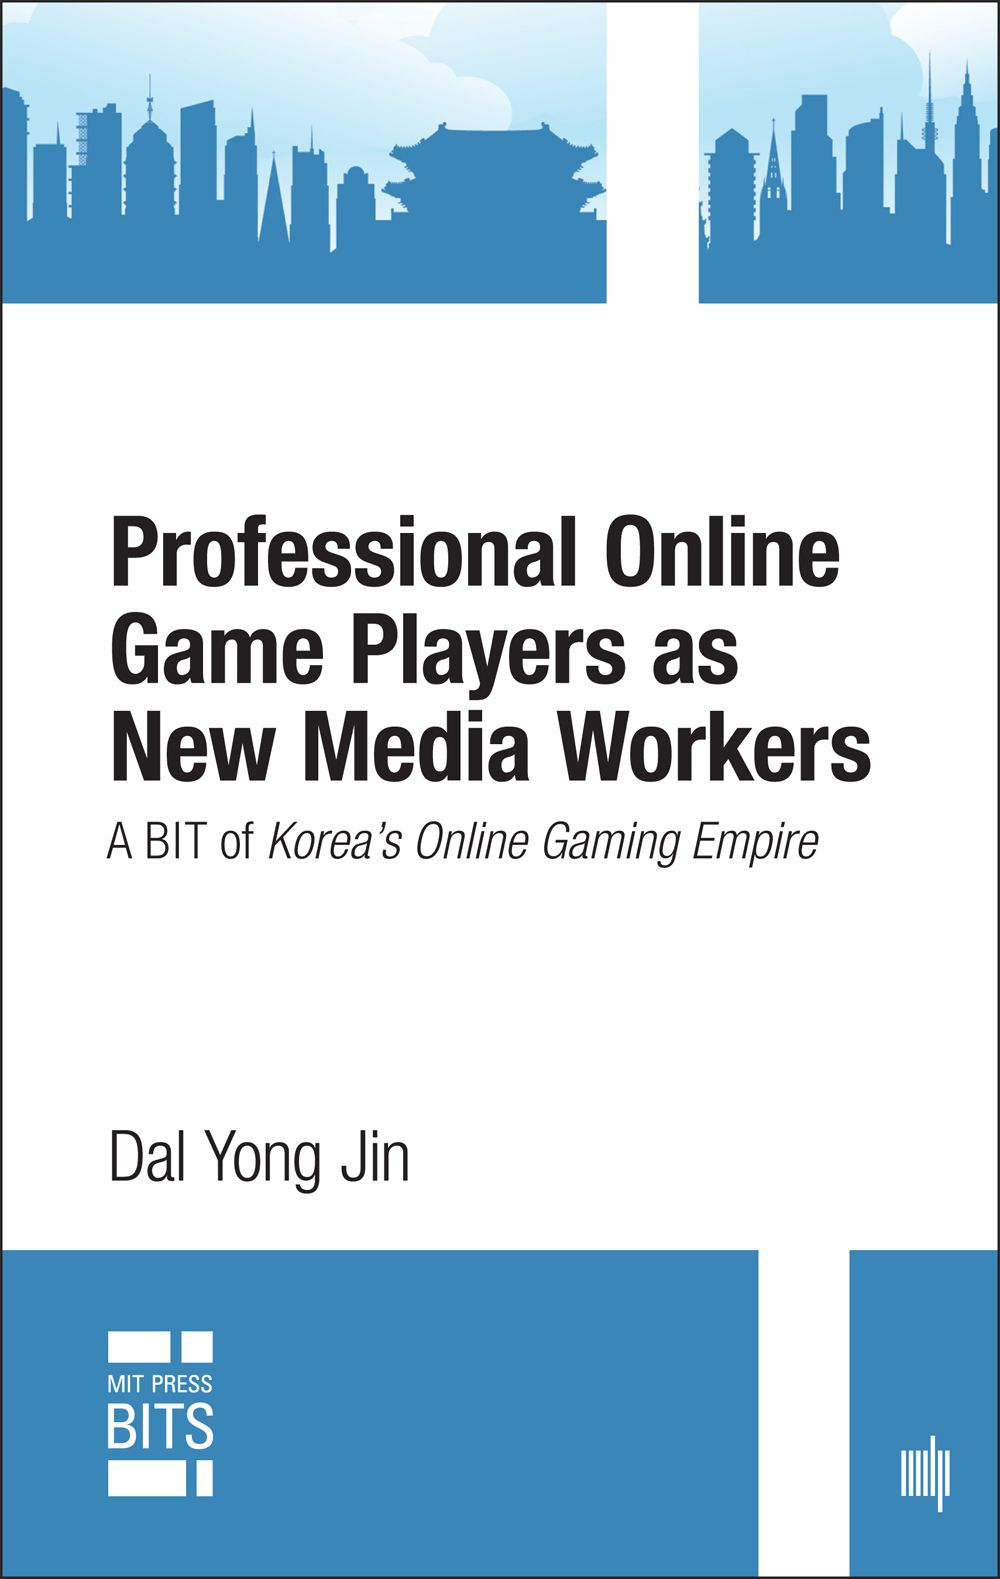 KoreaS Online Gaming Empire